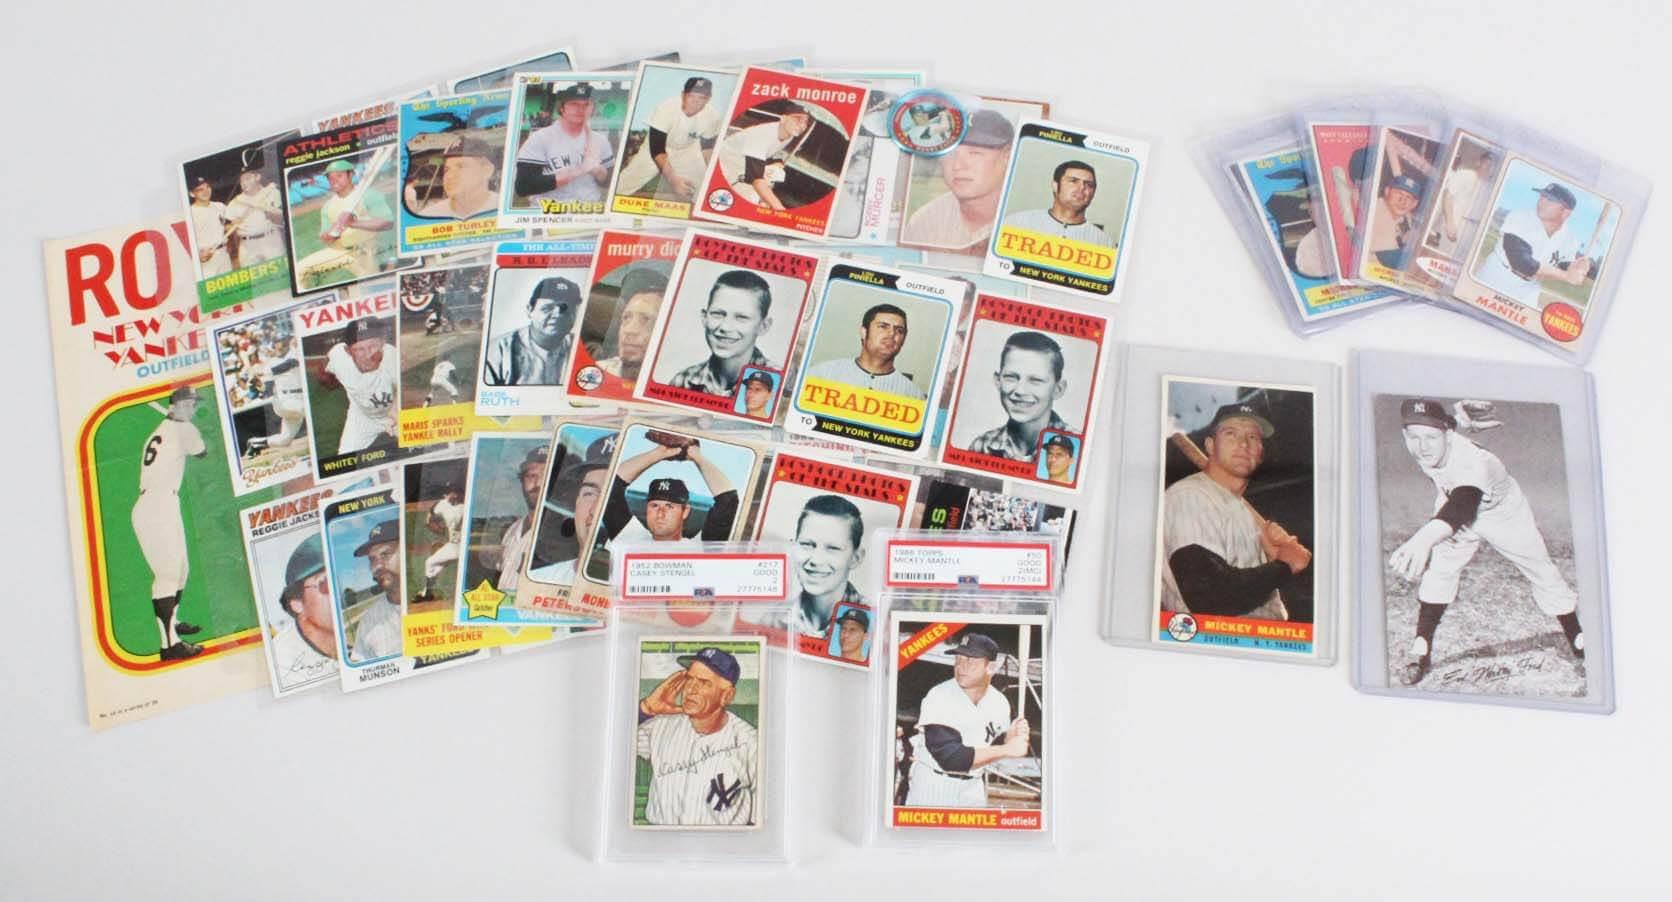 New York Yankees Vintage Baseball Card Lot (63) - Mickey Mantle, Roger Maris, Lou Gehrig etc.